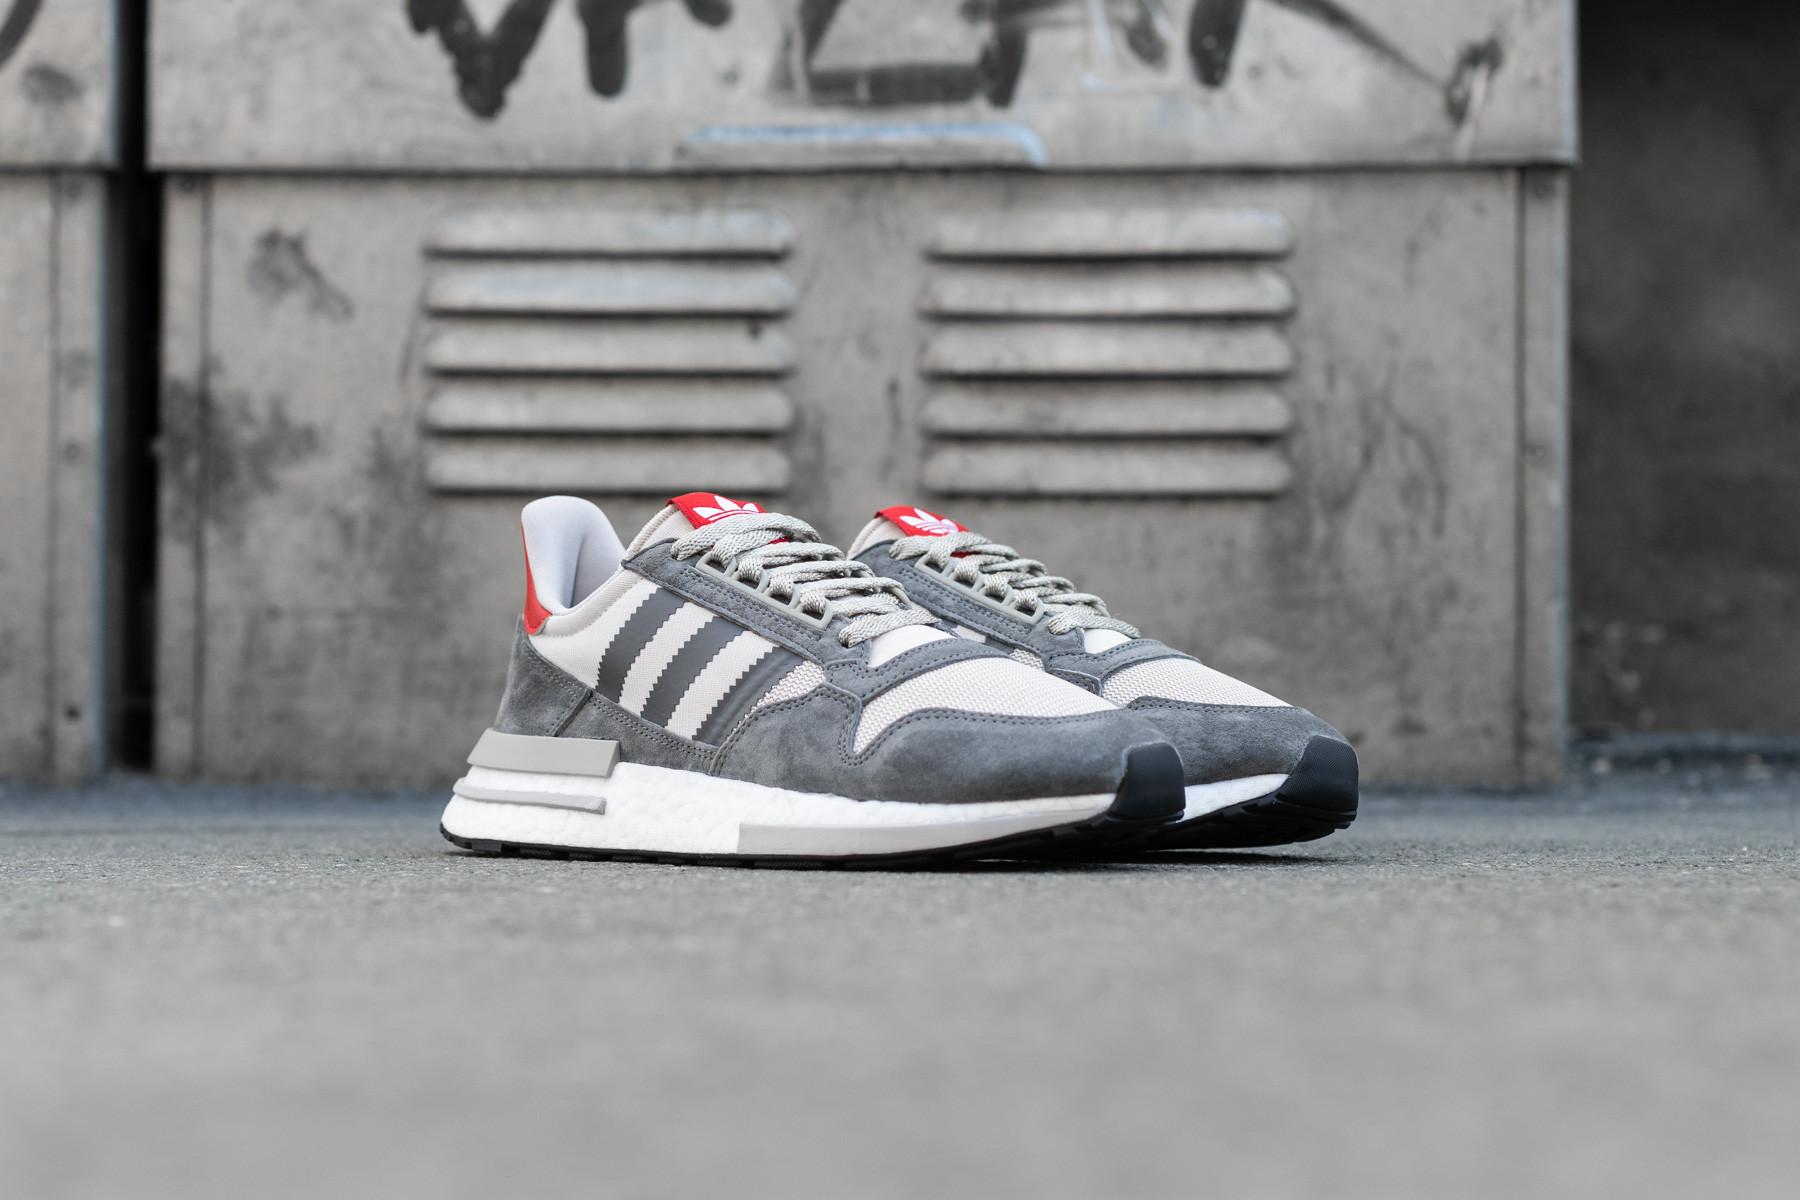 Adidas ZX 500 RM Sneaker.no